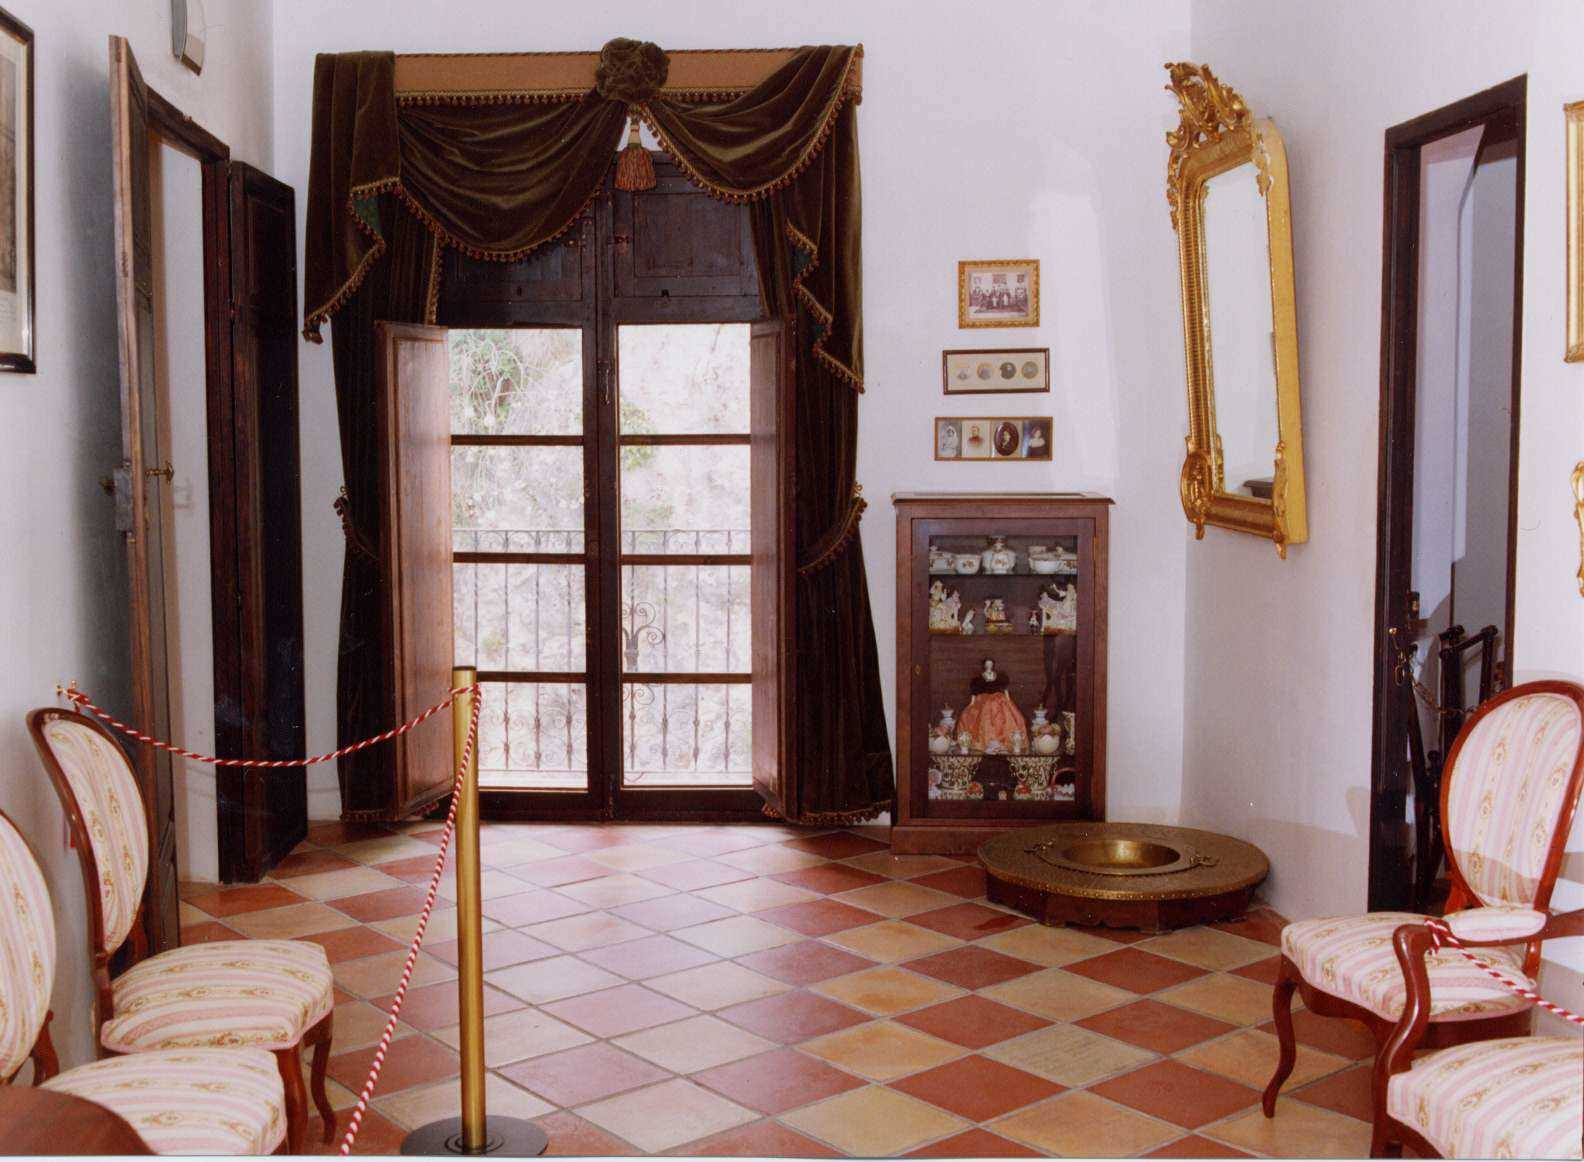 Museu municipal Casa Orduña